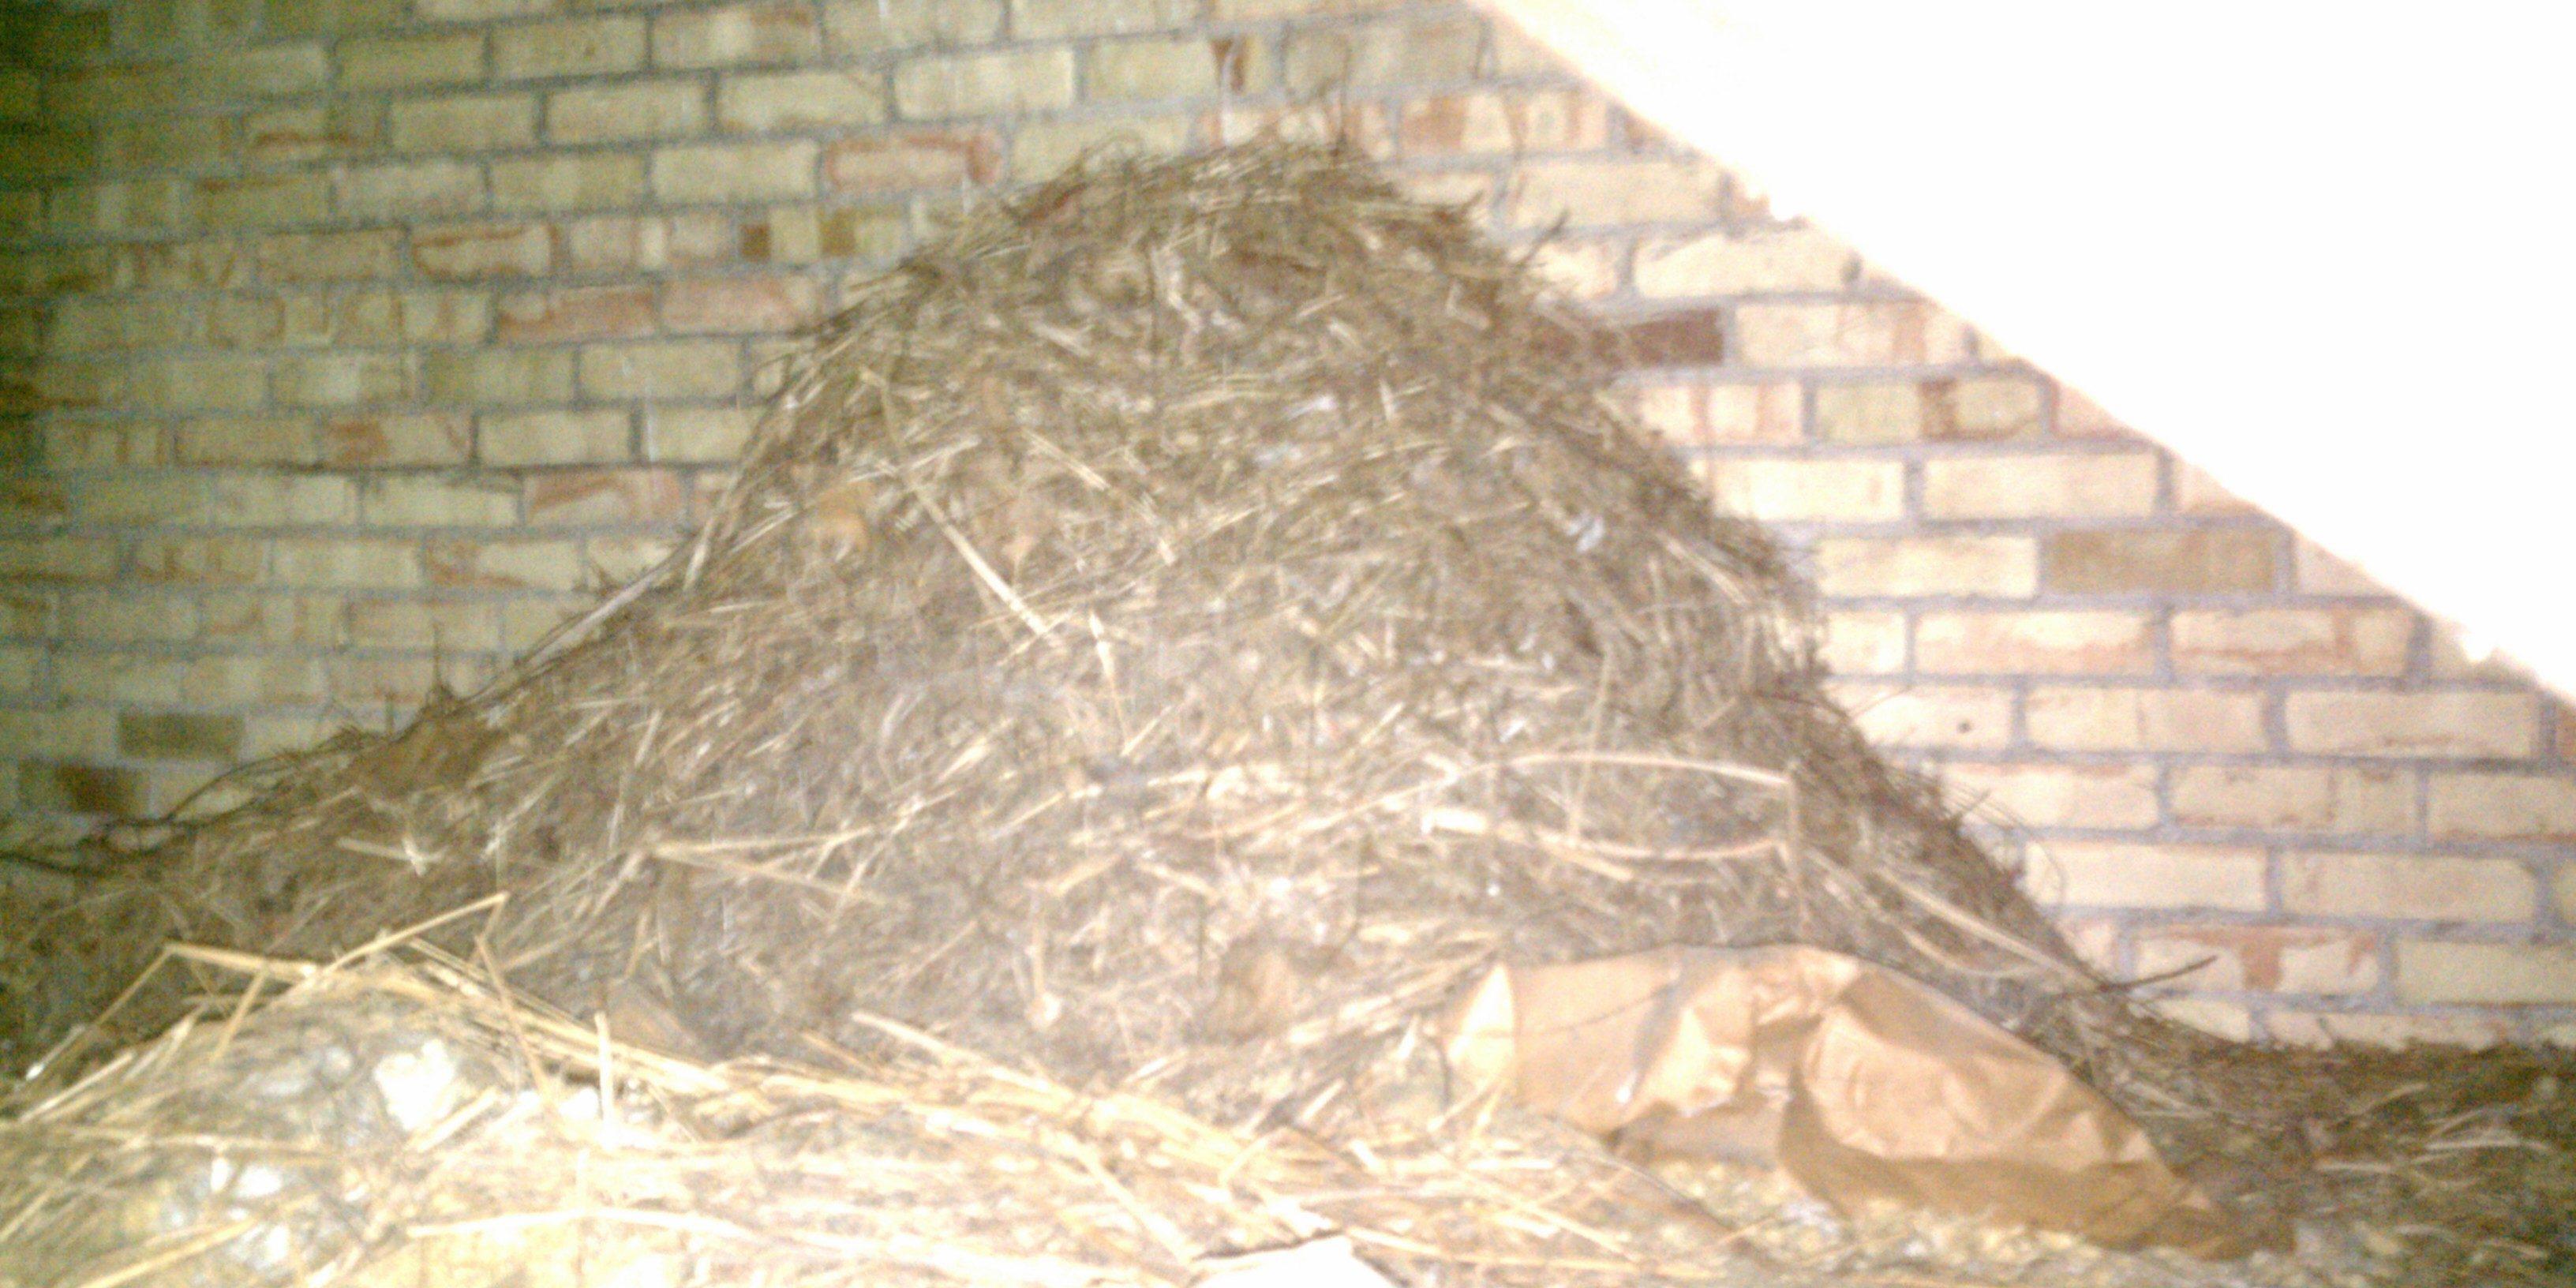 Michigan Bird Control Nest Clean up